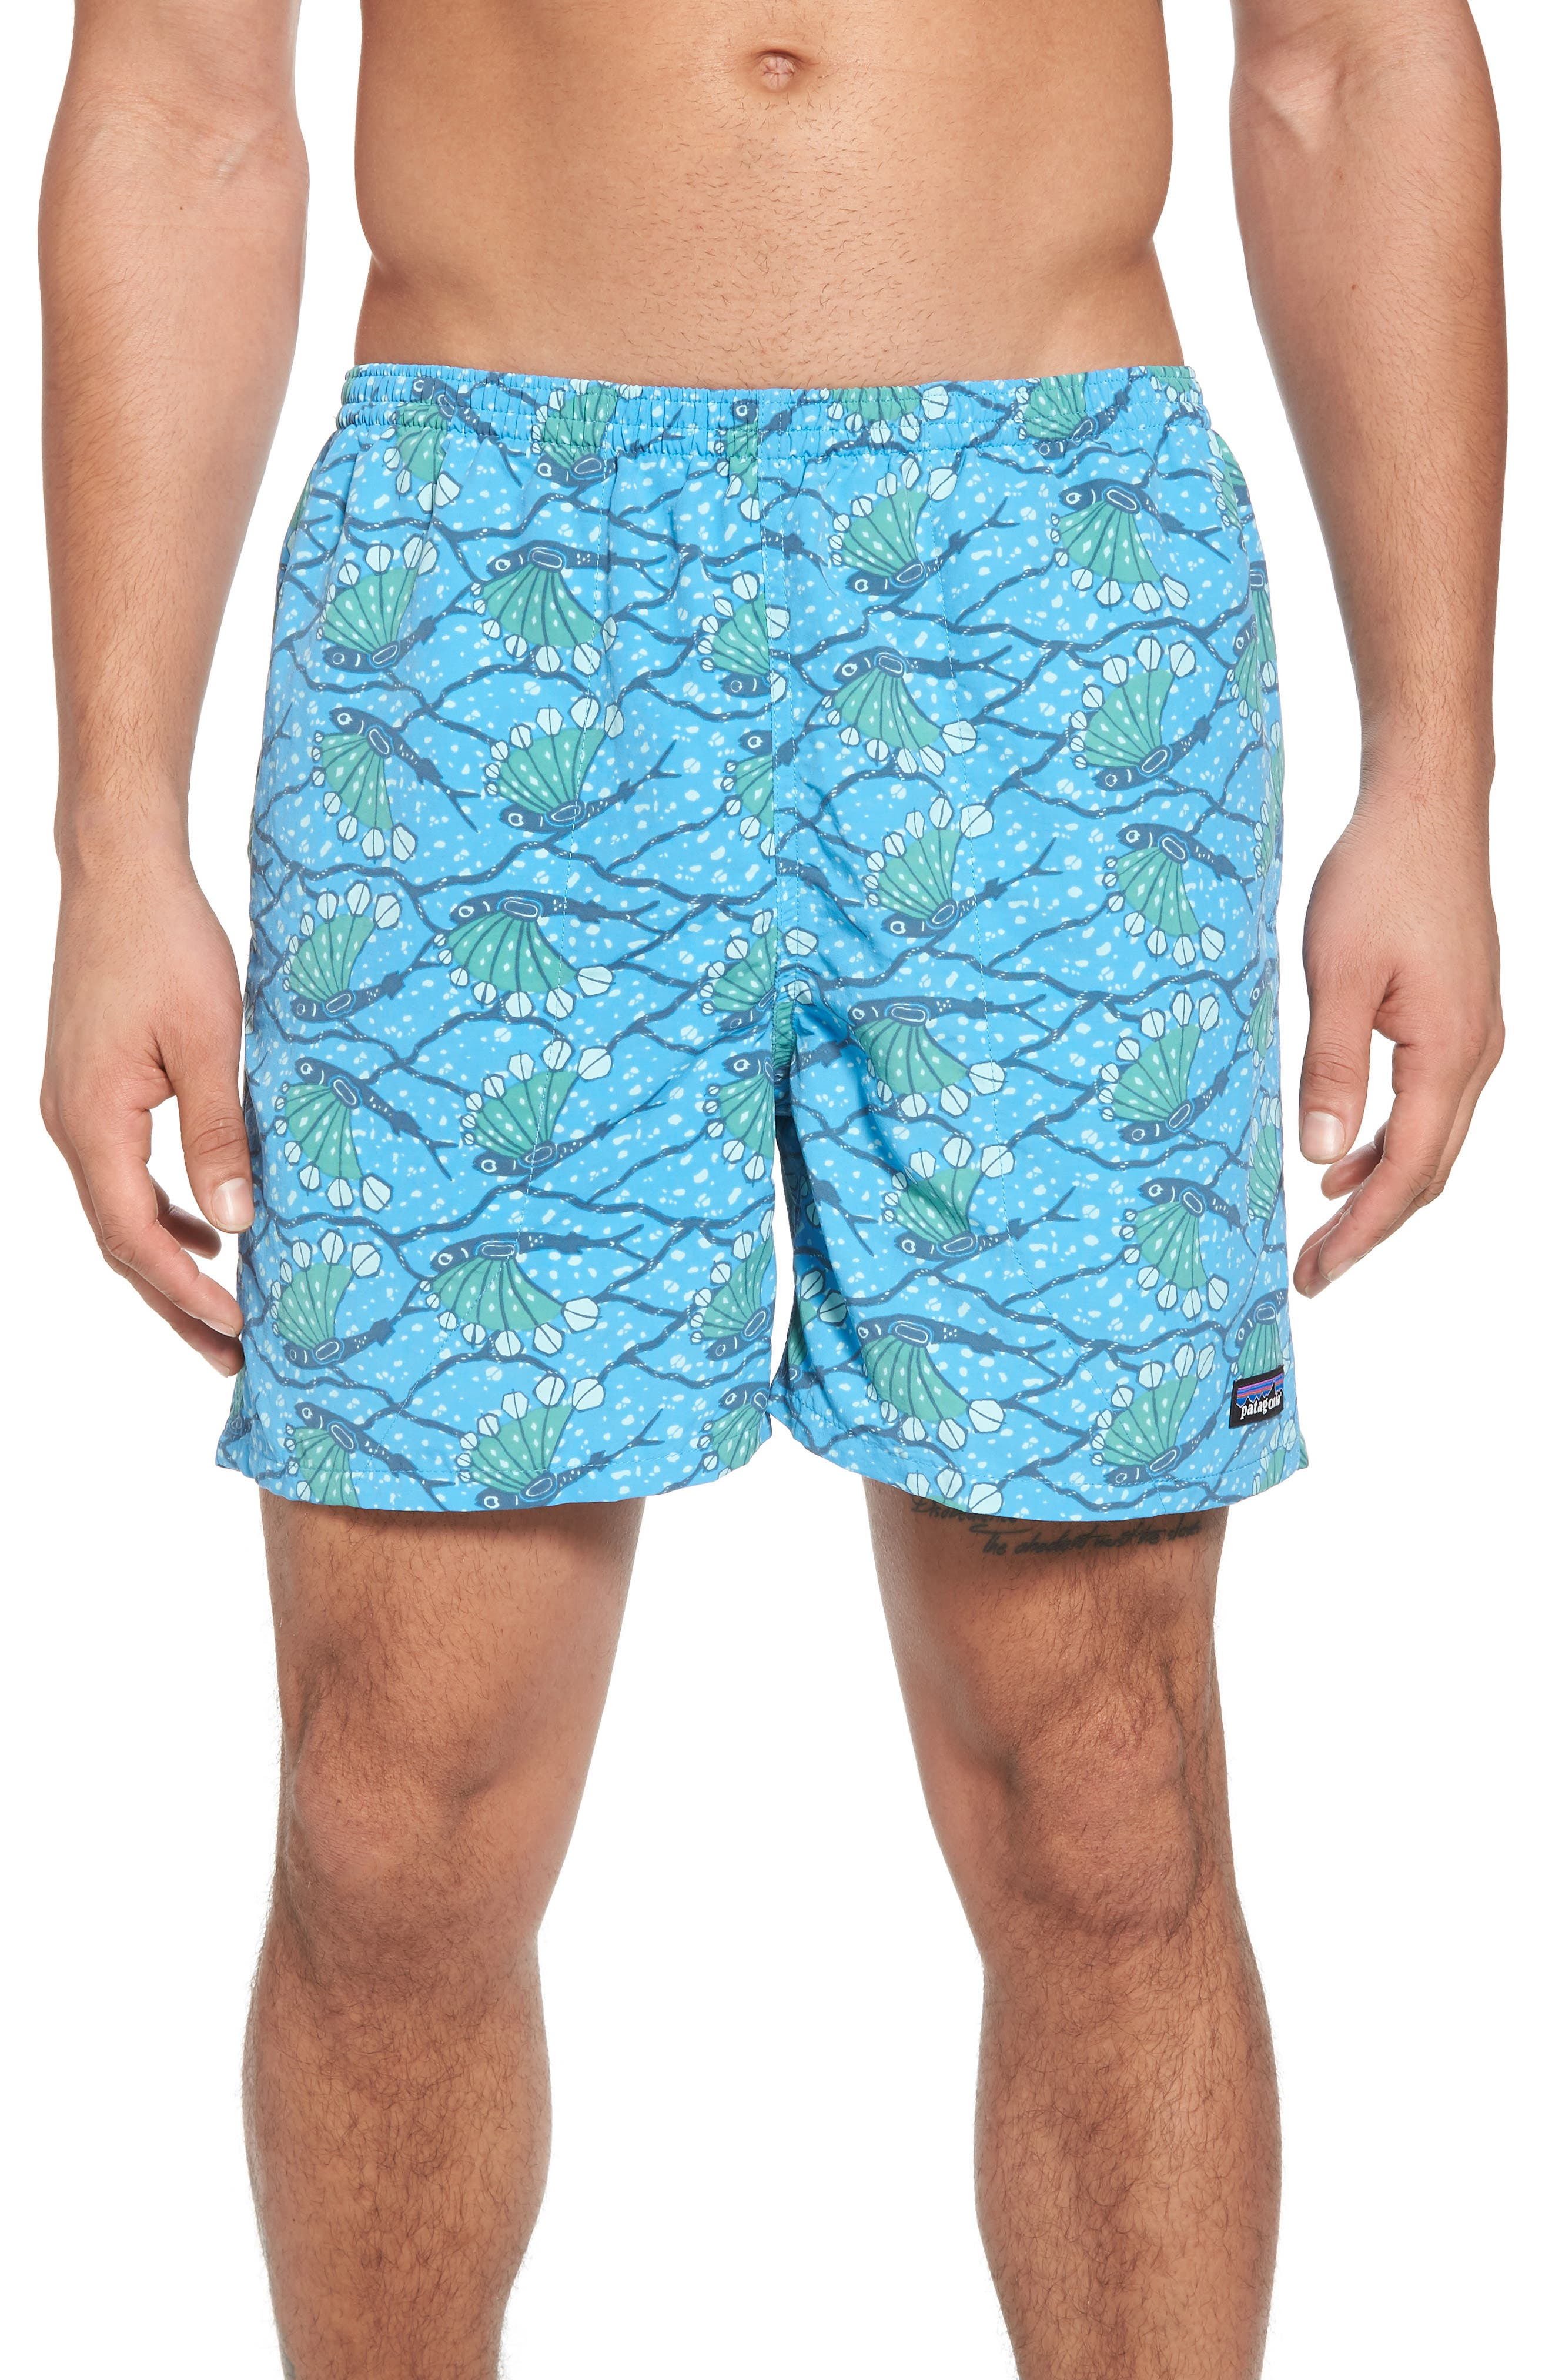 Baggies 5-Inch Swim Trunks,                         Main,                         color, Hexy Fish Radar Blue